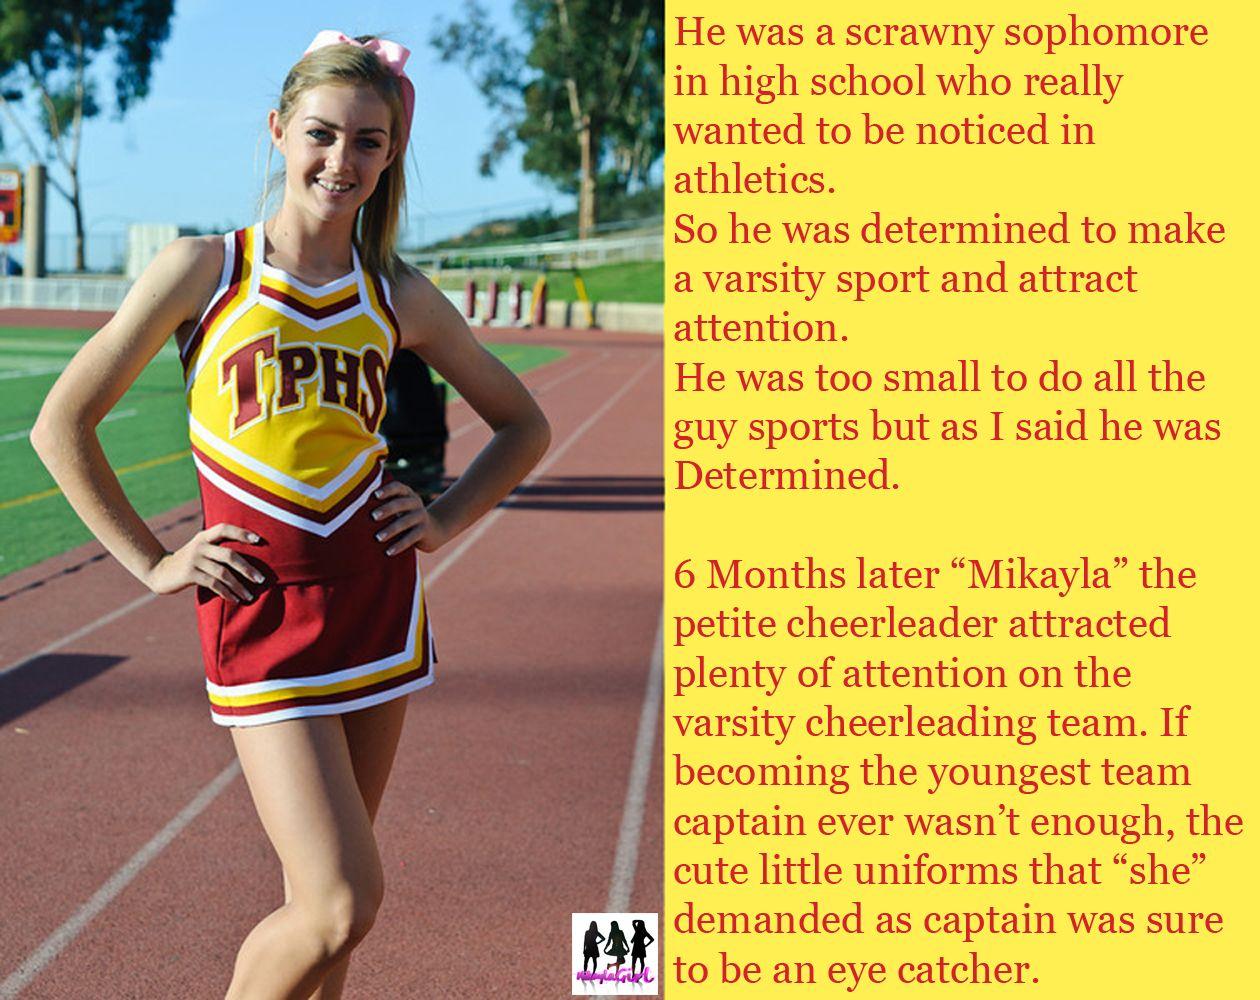 Tg Caption Cheerleader 5